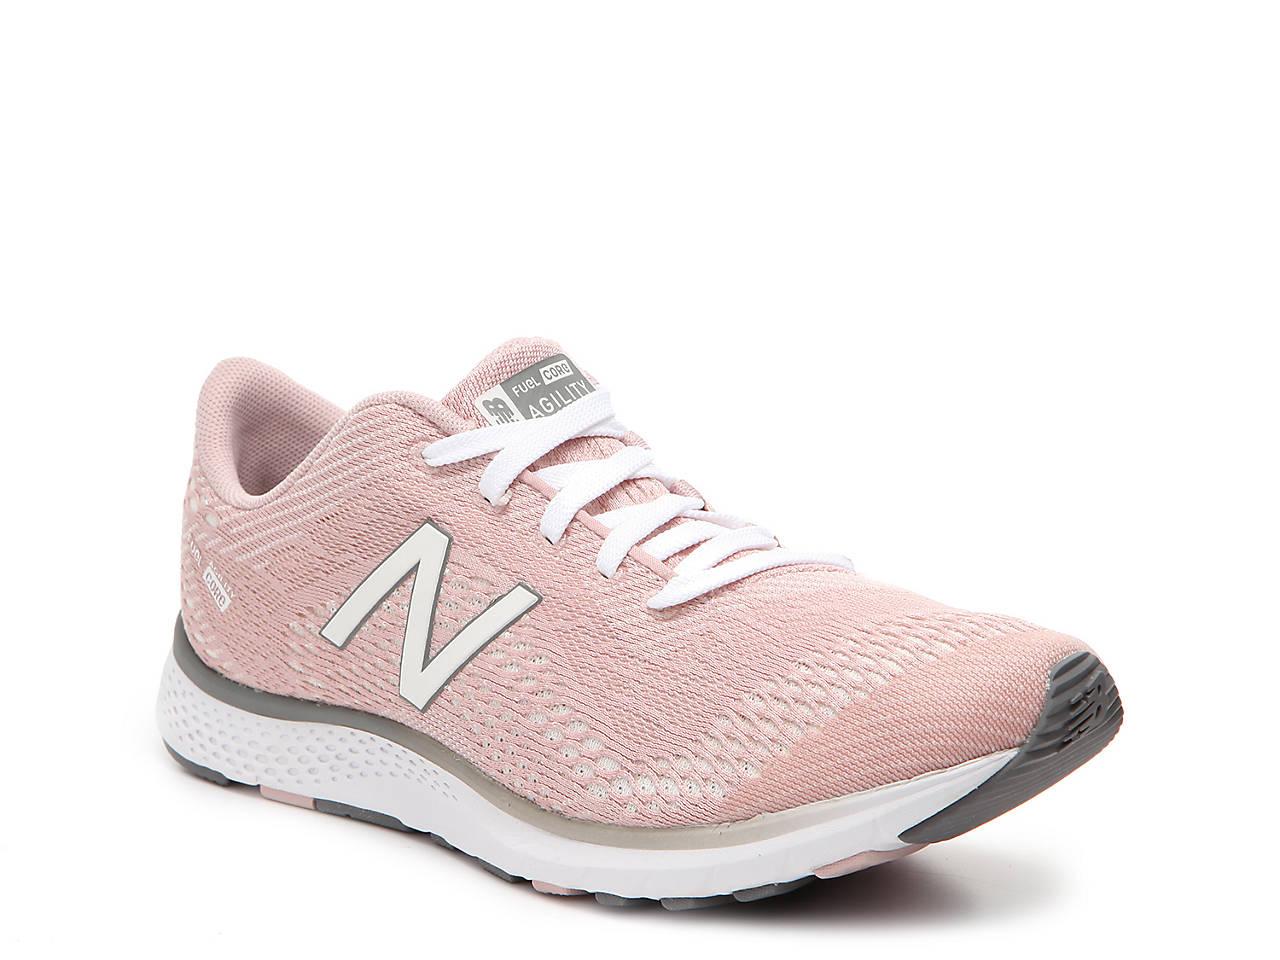 80d0c230a7cd3 New Balance FuelCore Agility V2 Training Shoe - Women's Women's ...